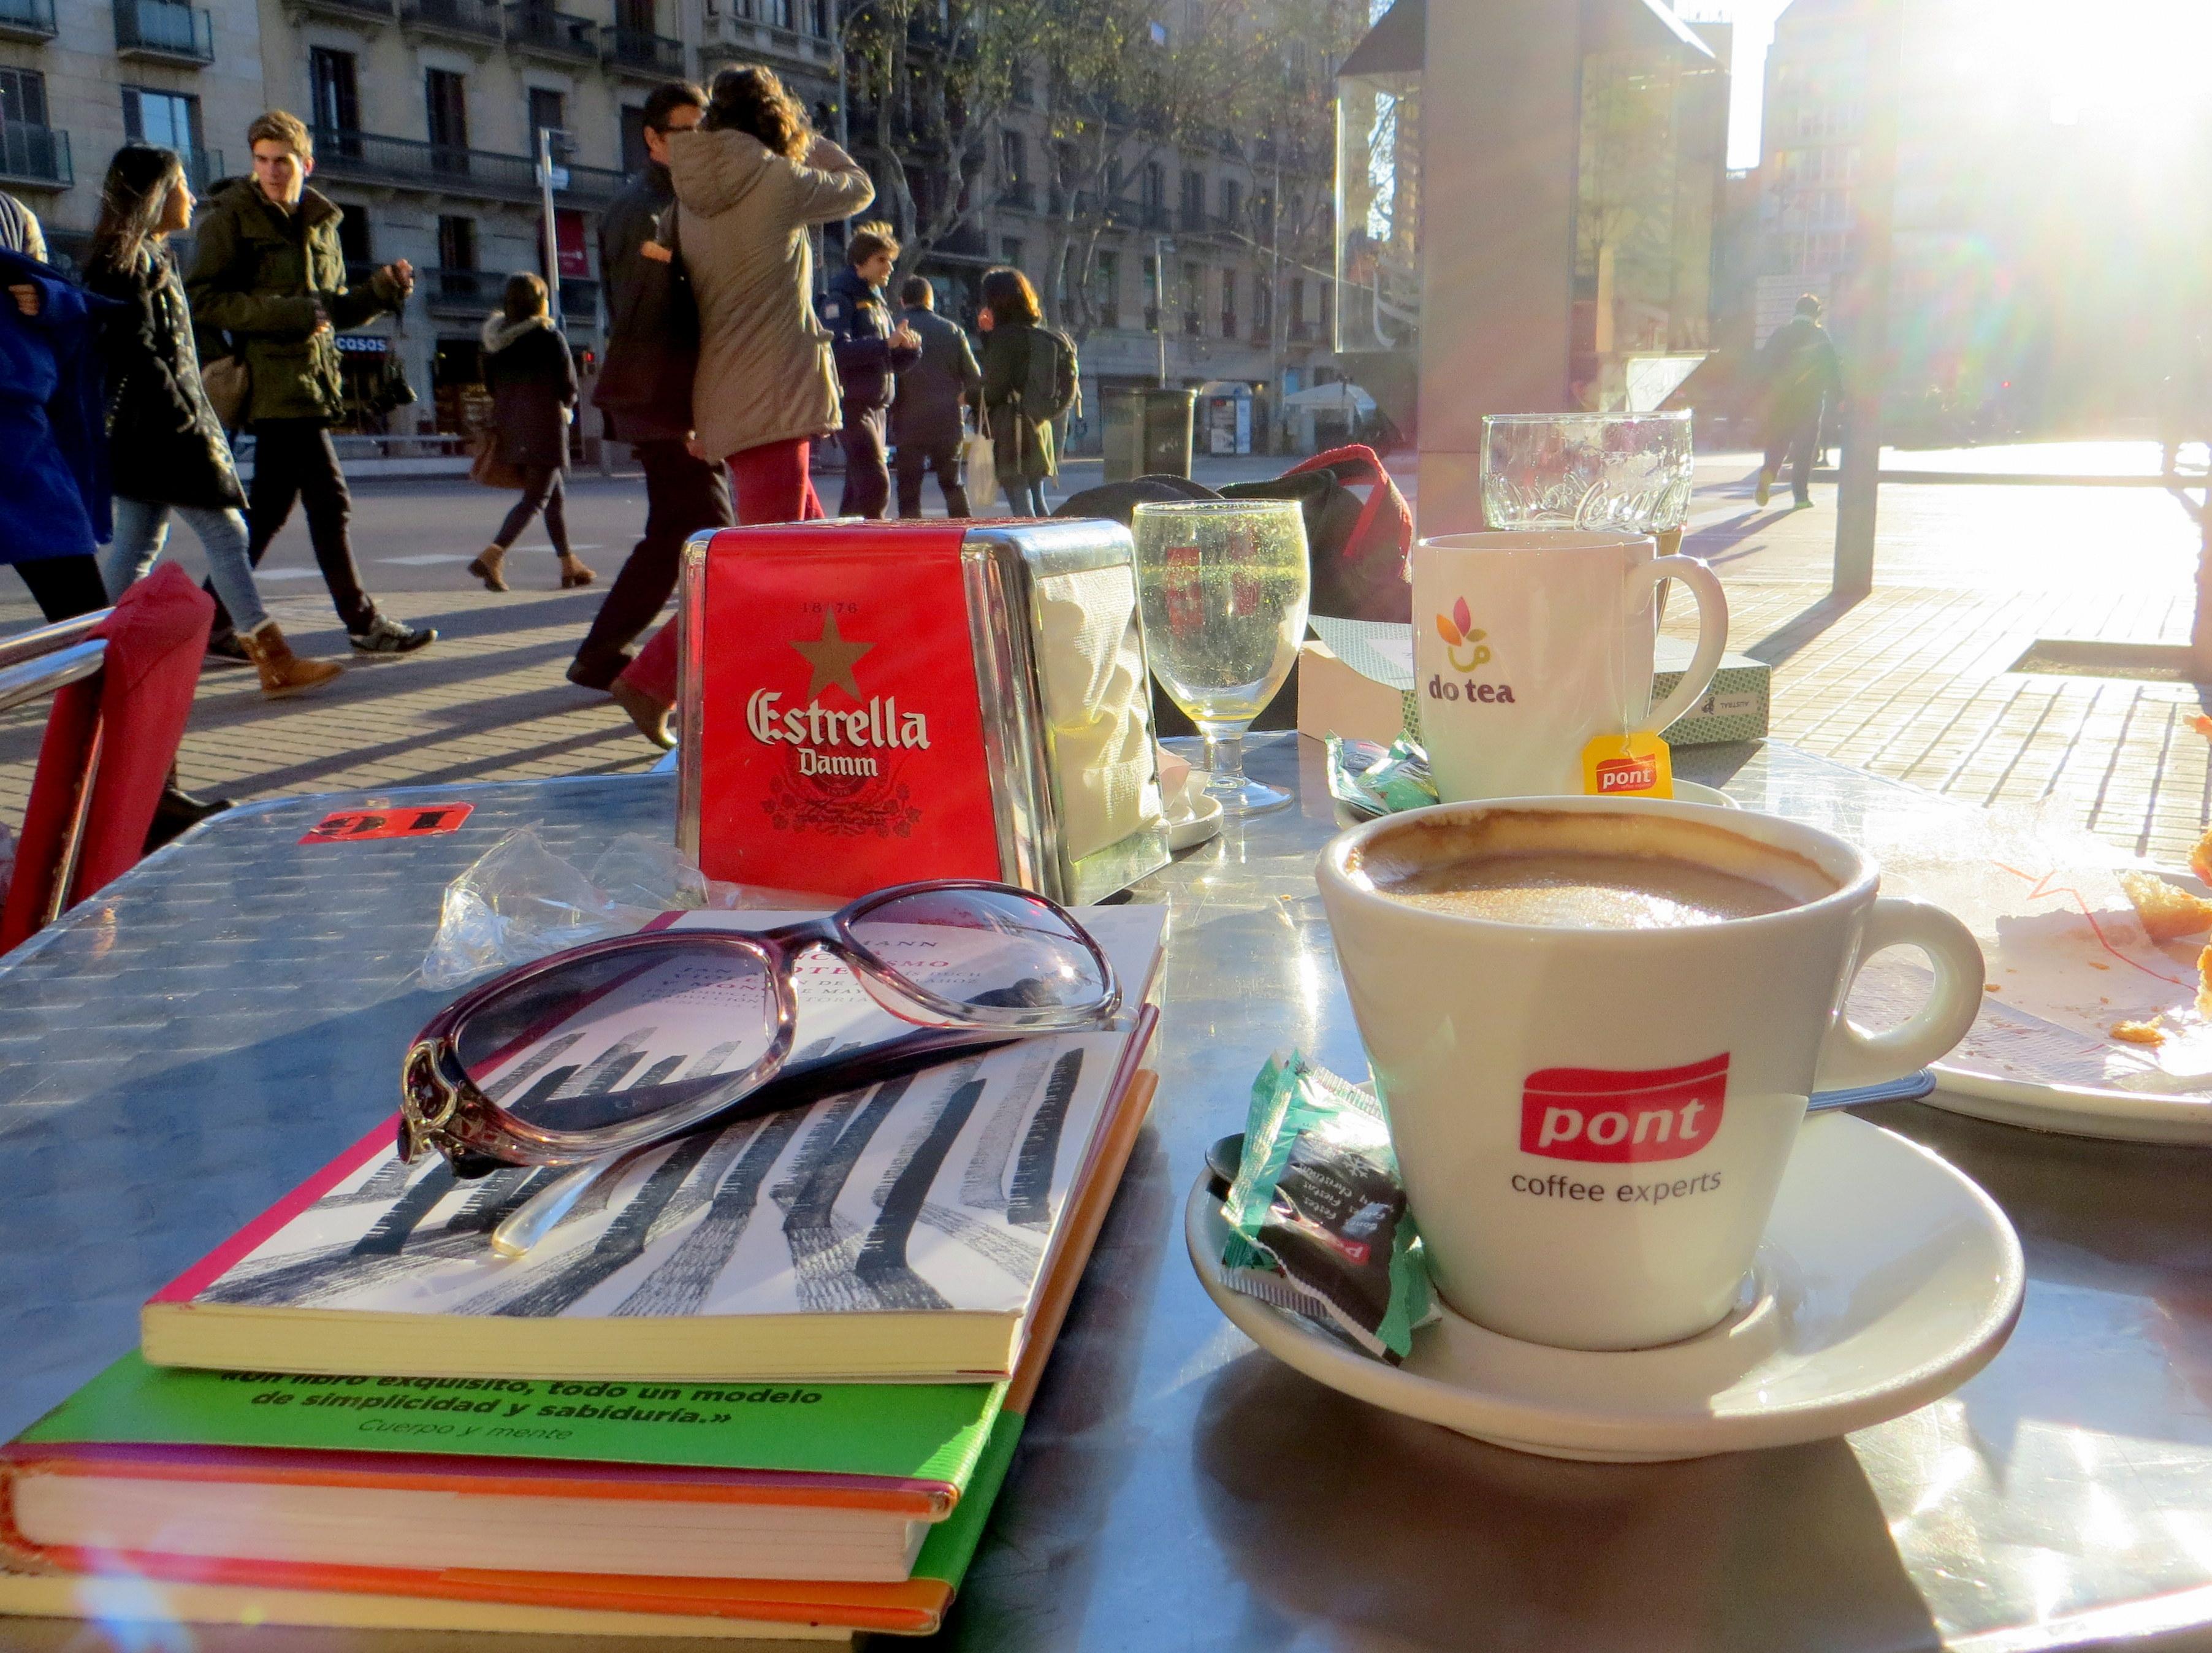 Fotos gratis : cafetería, lío, mesa, gafas, Nerd, libros, turismo ...